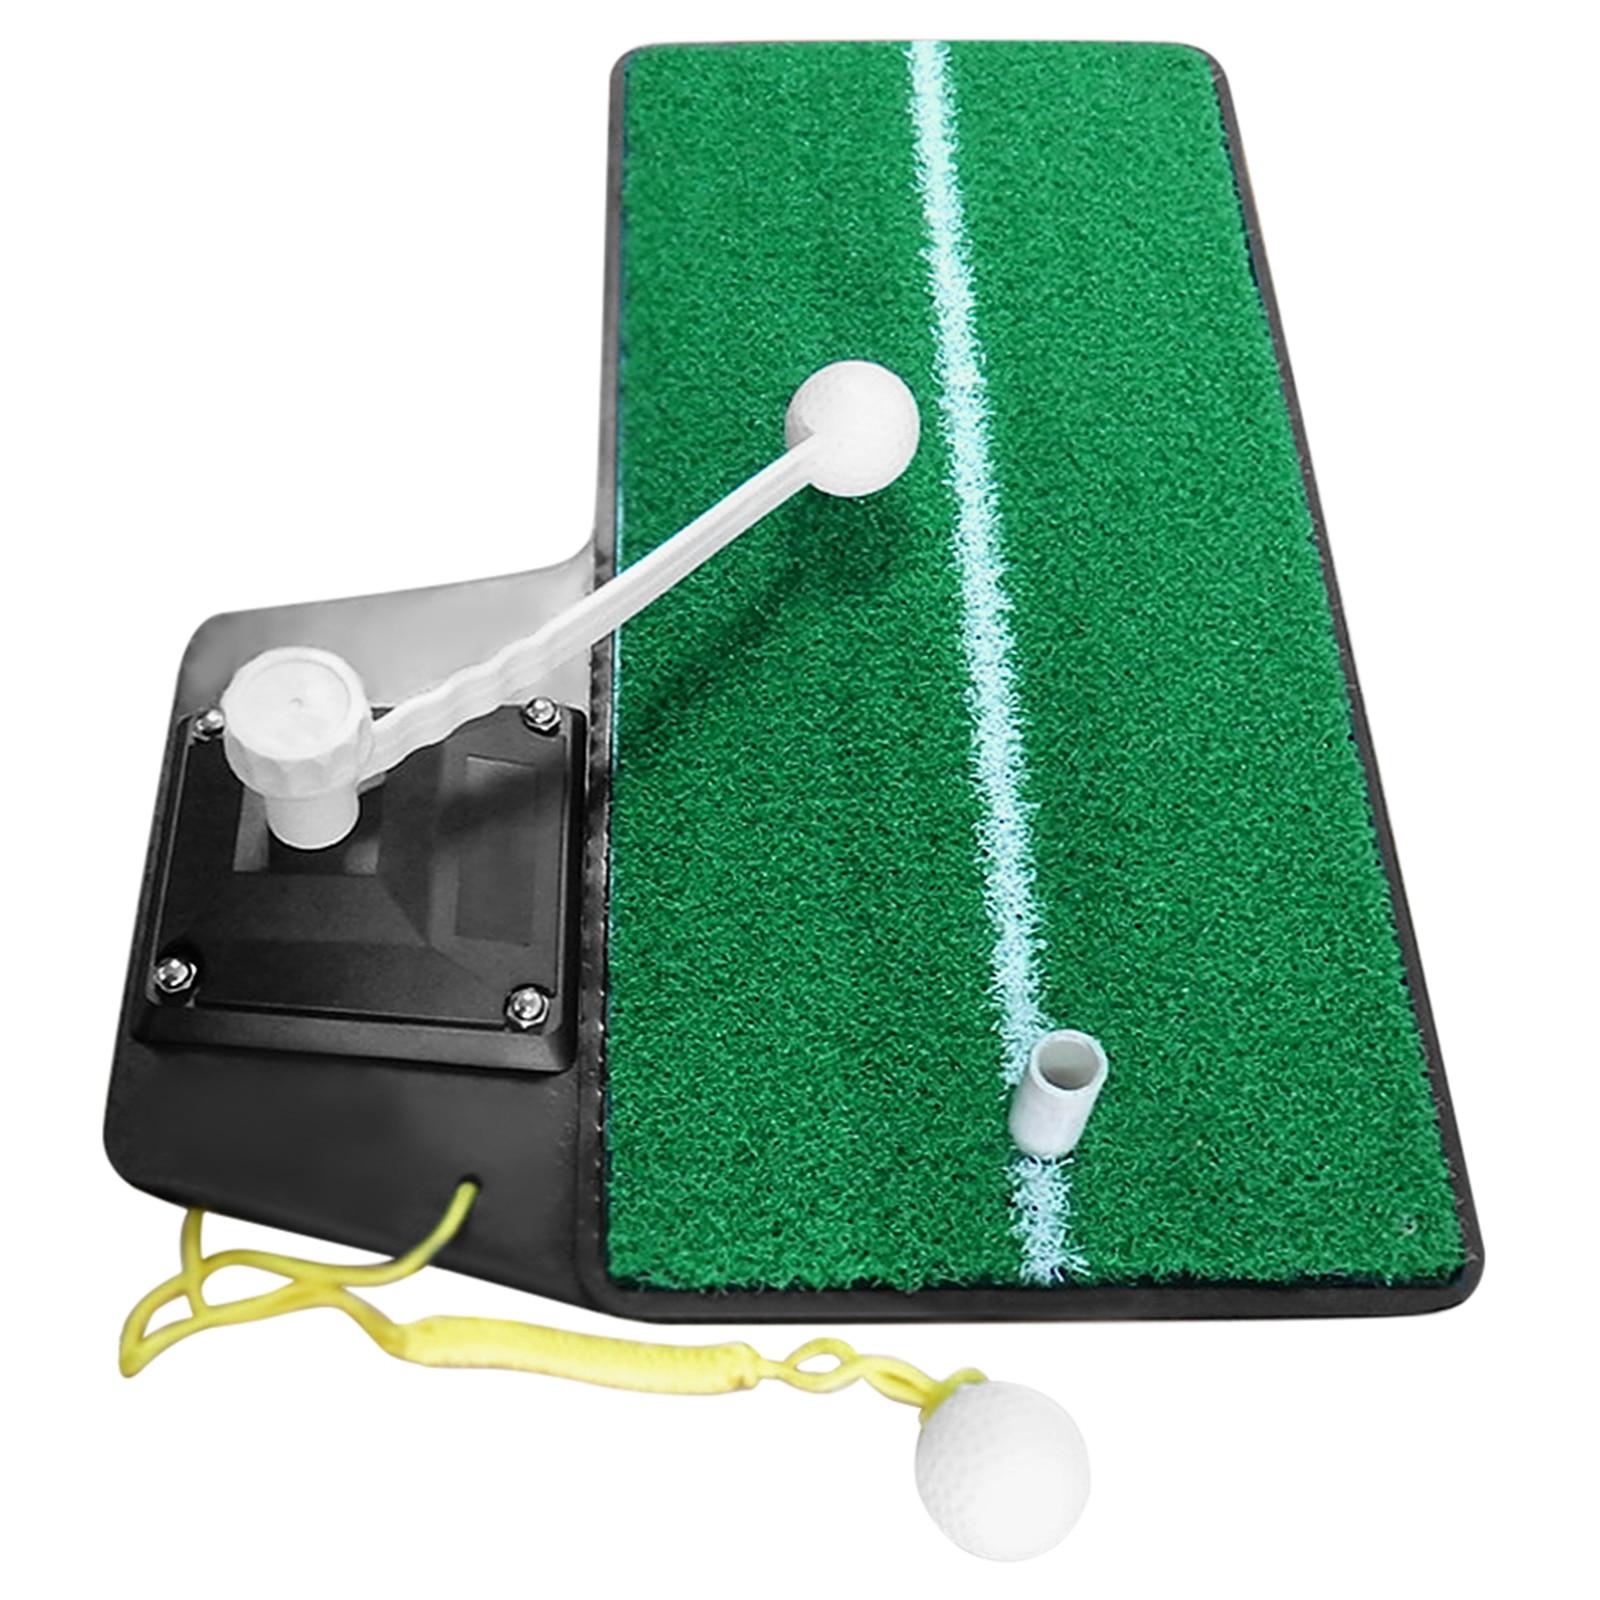 Golf Practice Swing Mat Golf Power Trainer Golf Grass Training Mat for Outdoor Indoor Home Garden Office Camping